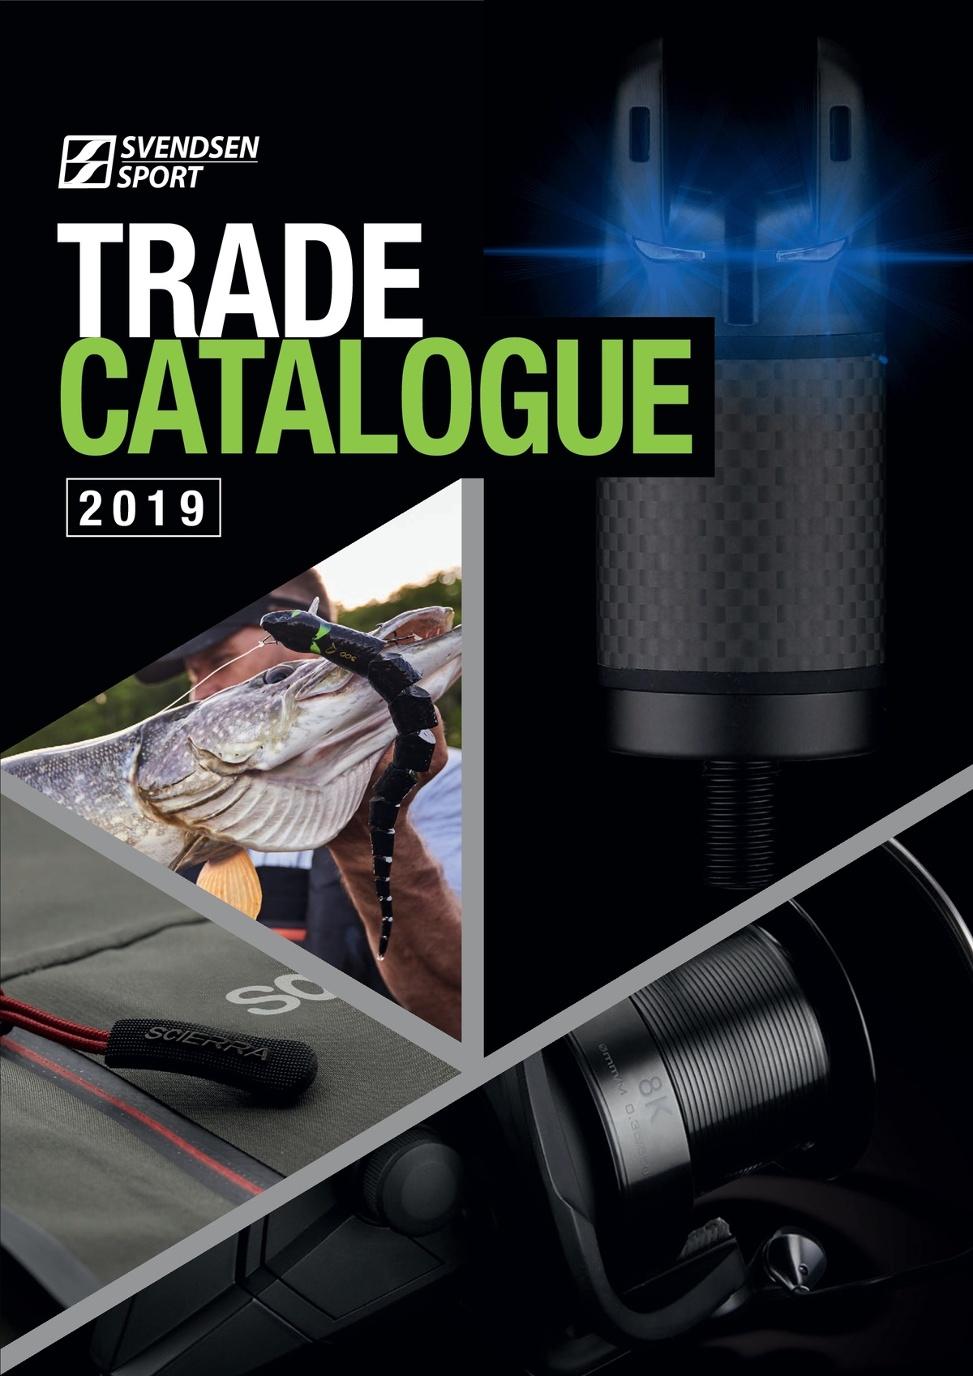 Svendsen Sport Trade Catalogue 2019